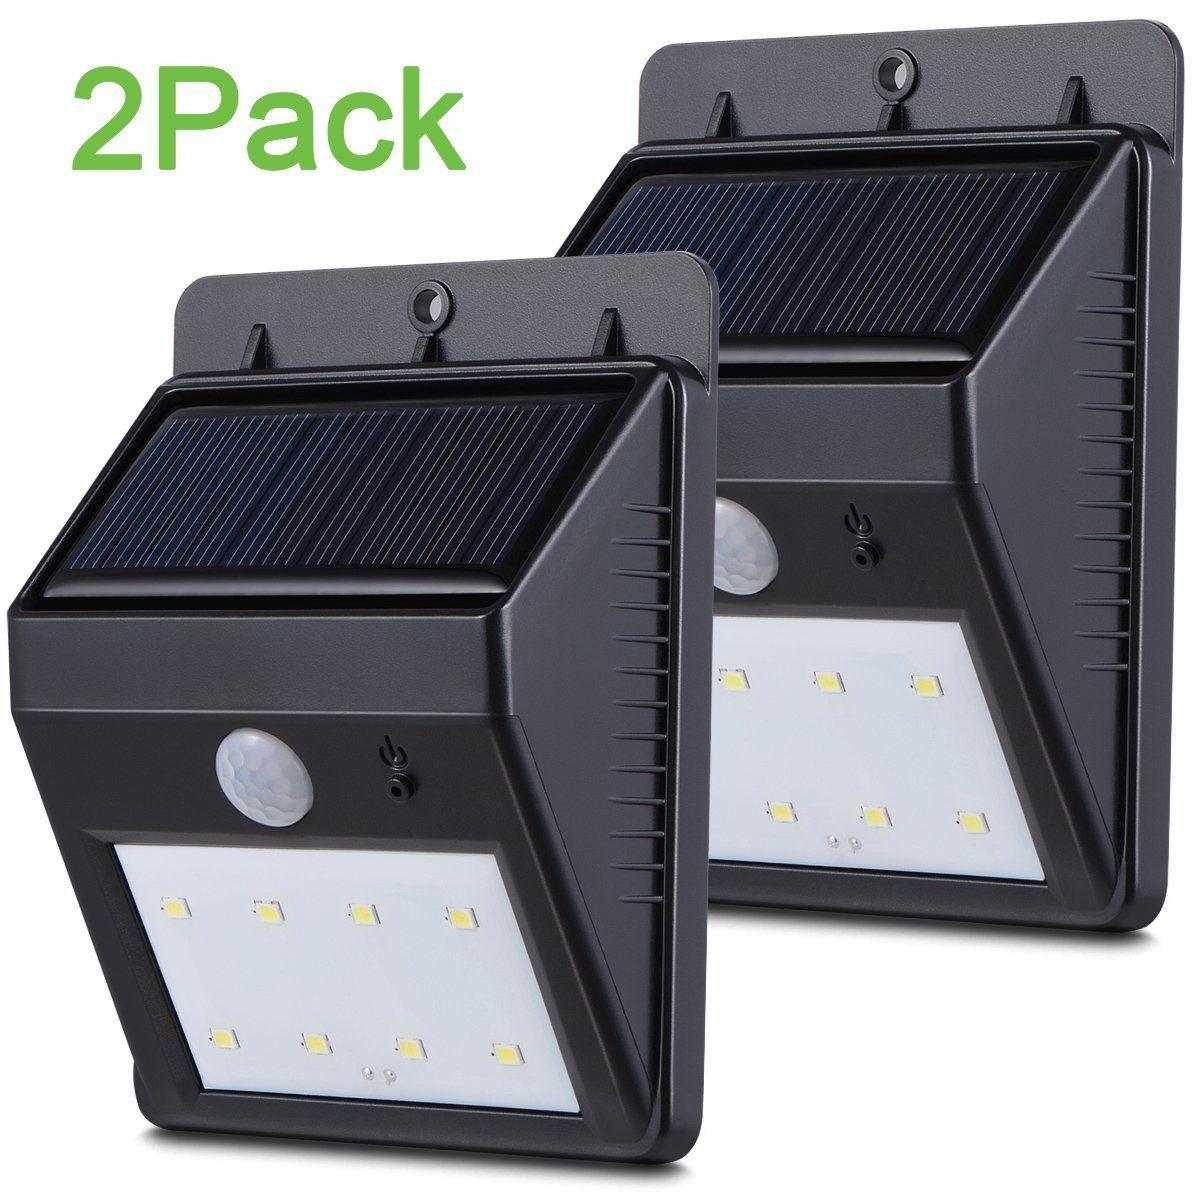 Bright Outdoor Solar Lights Boomile Super Bright Outside Waterproof Motion Sensor Lights Led